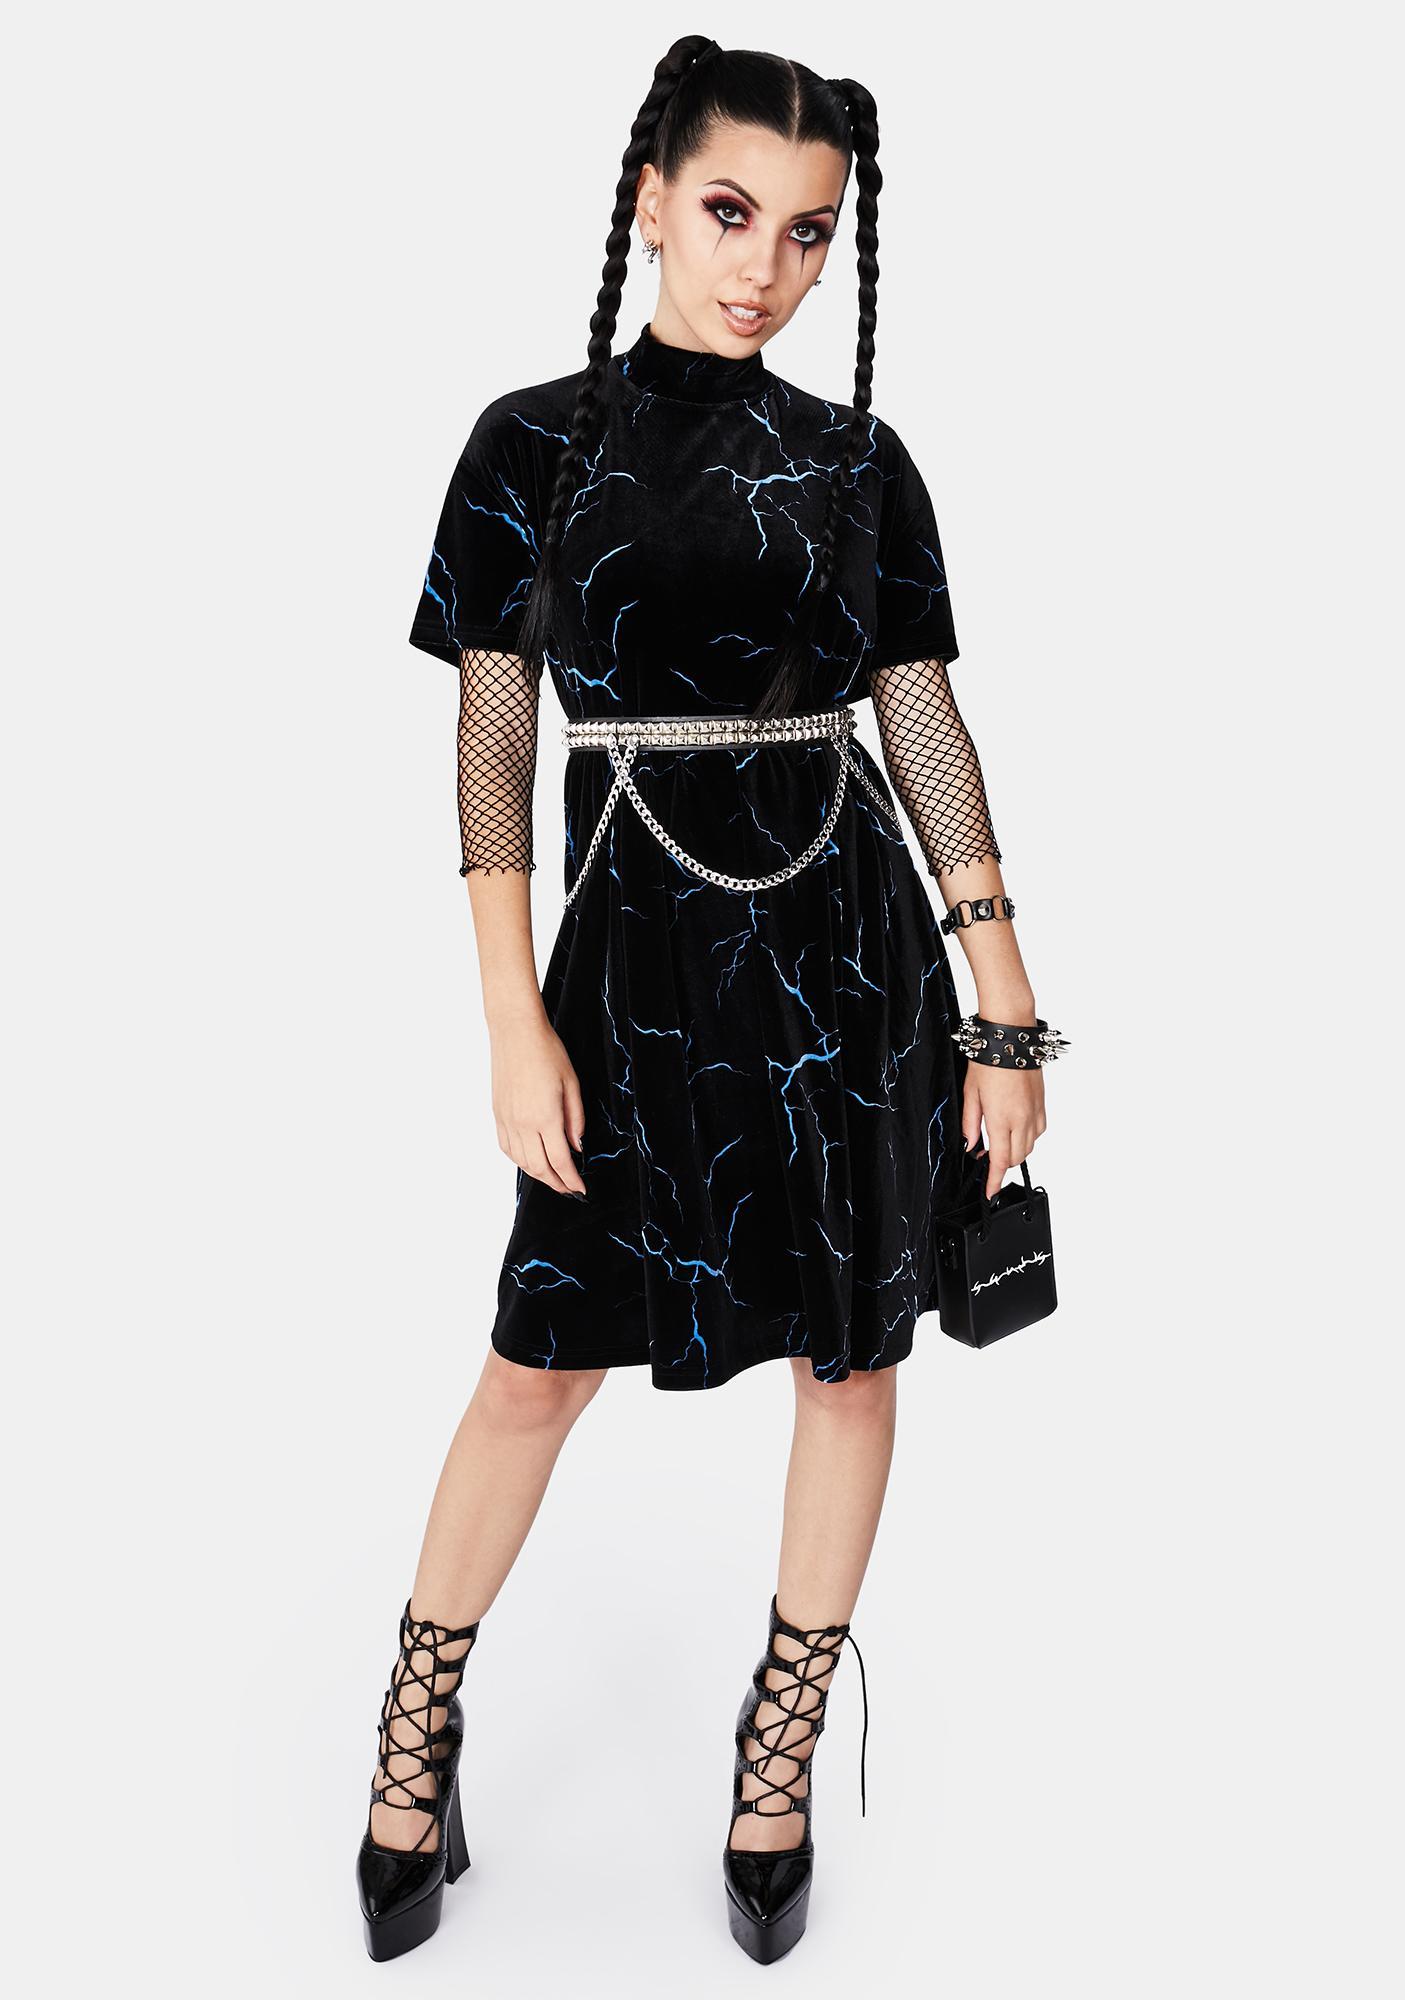 Black Friday Blue Zapped Mini Dress